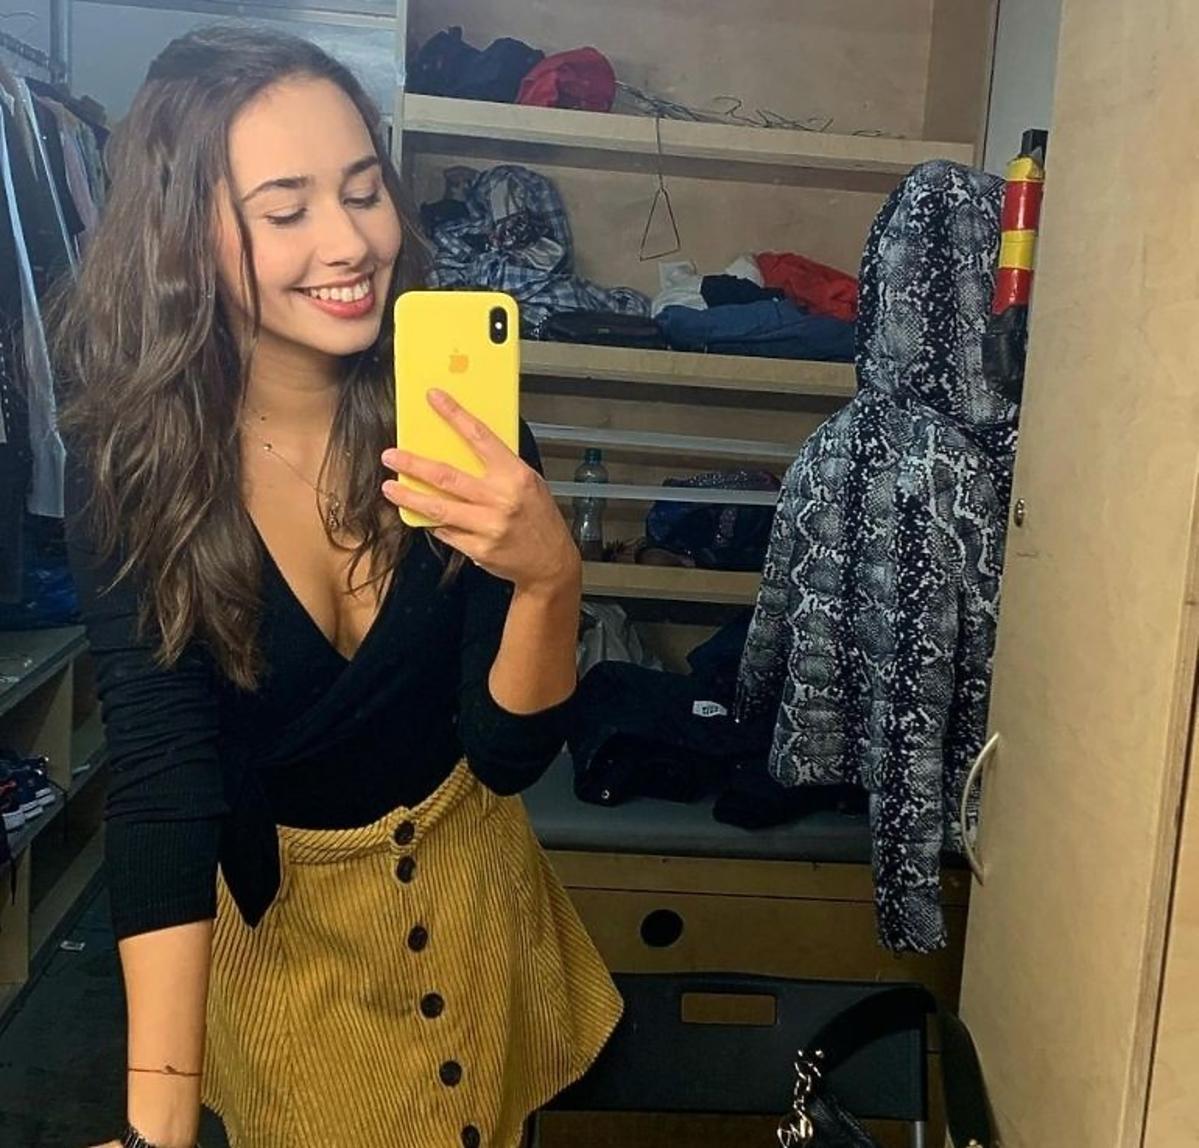 Marcelina Ziętek w żółtej spódnicy